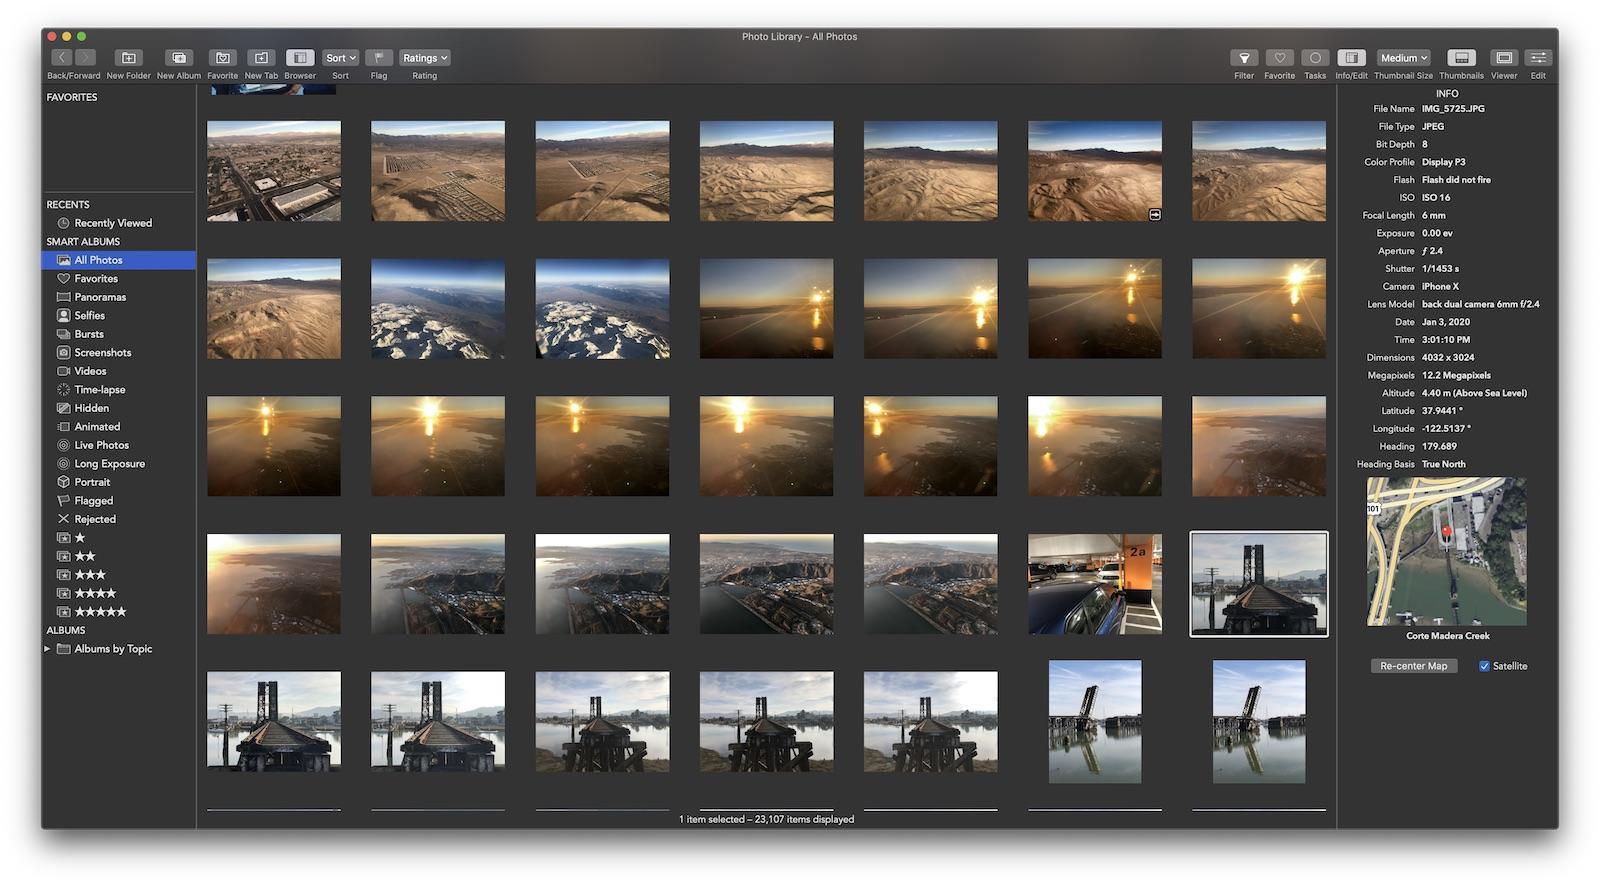 https://thedigitalstory.com/2020/04/16/RAW-Power-3-Photos.jpg